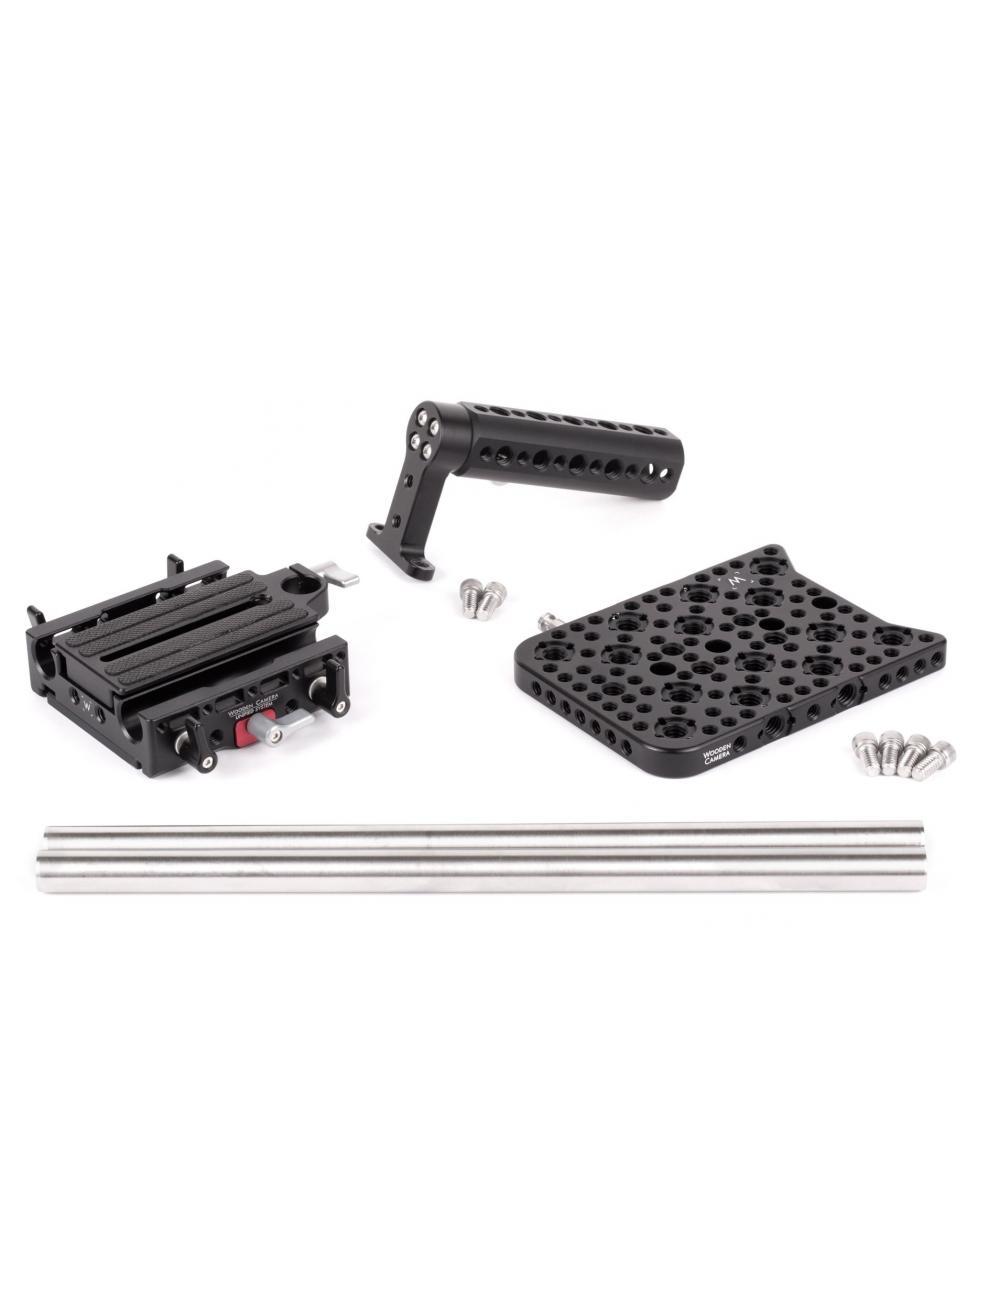 Wooden Camera Blackmagic URSA Mini Unified Accessory Kit (Base)